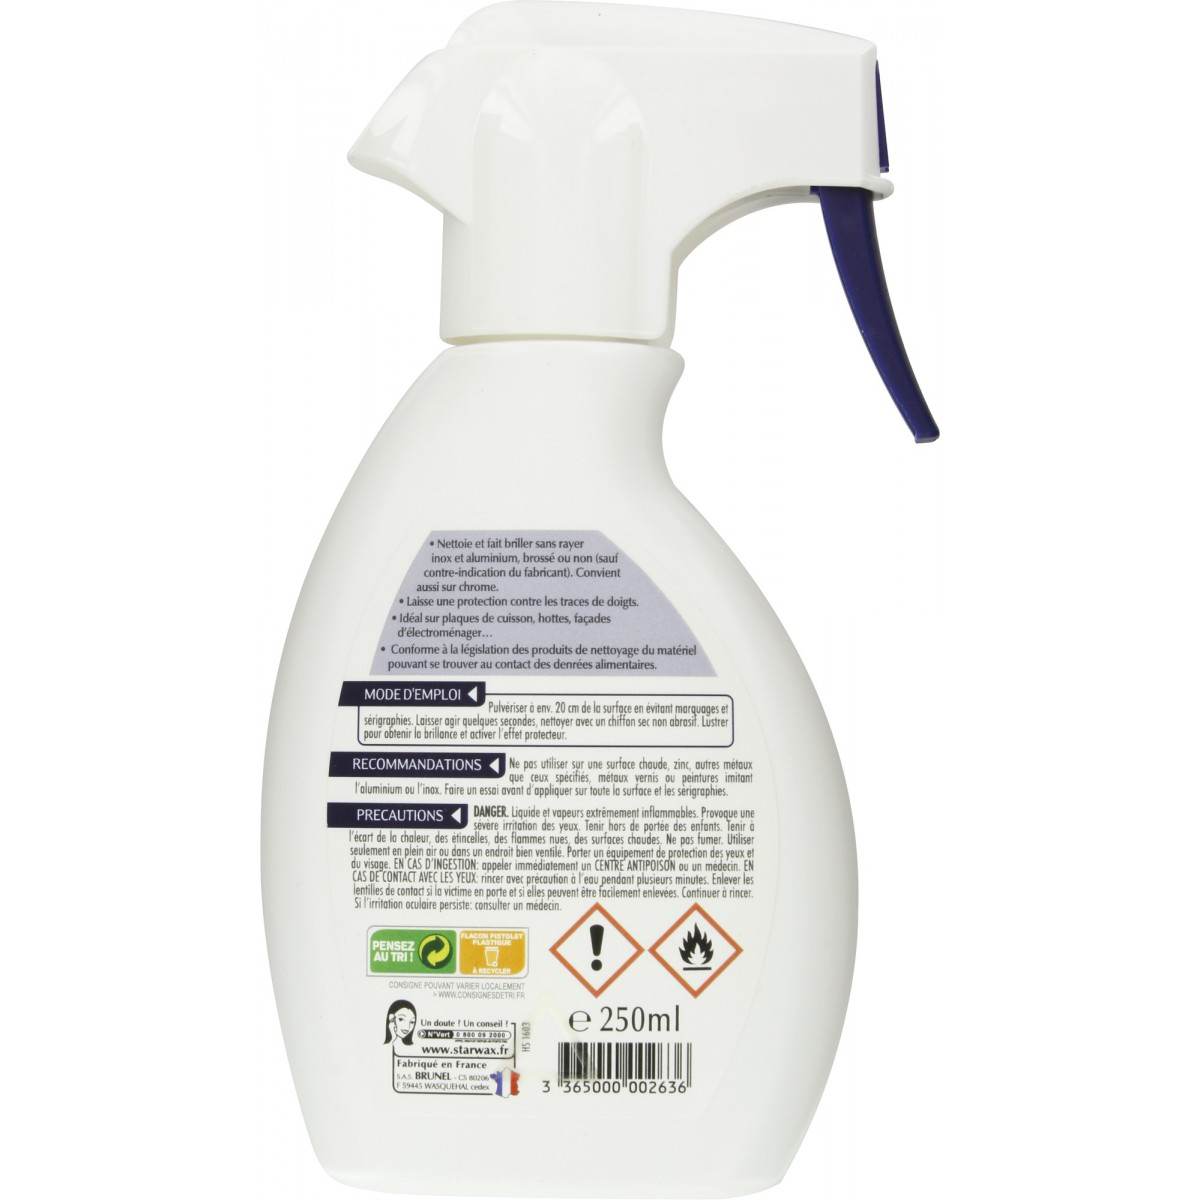 Nettoyant protecteur alu-inox Starwax - Pulvérisateur 250 ml